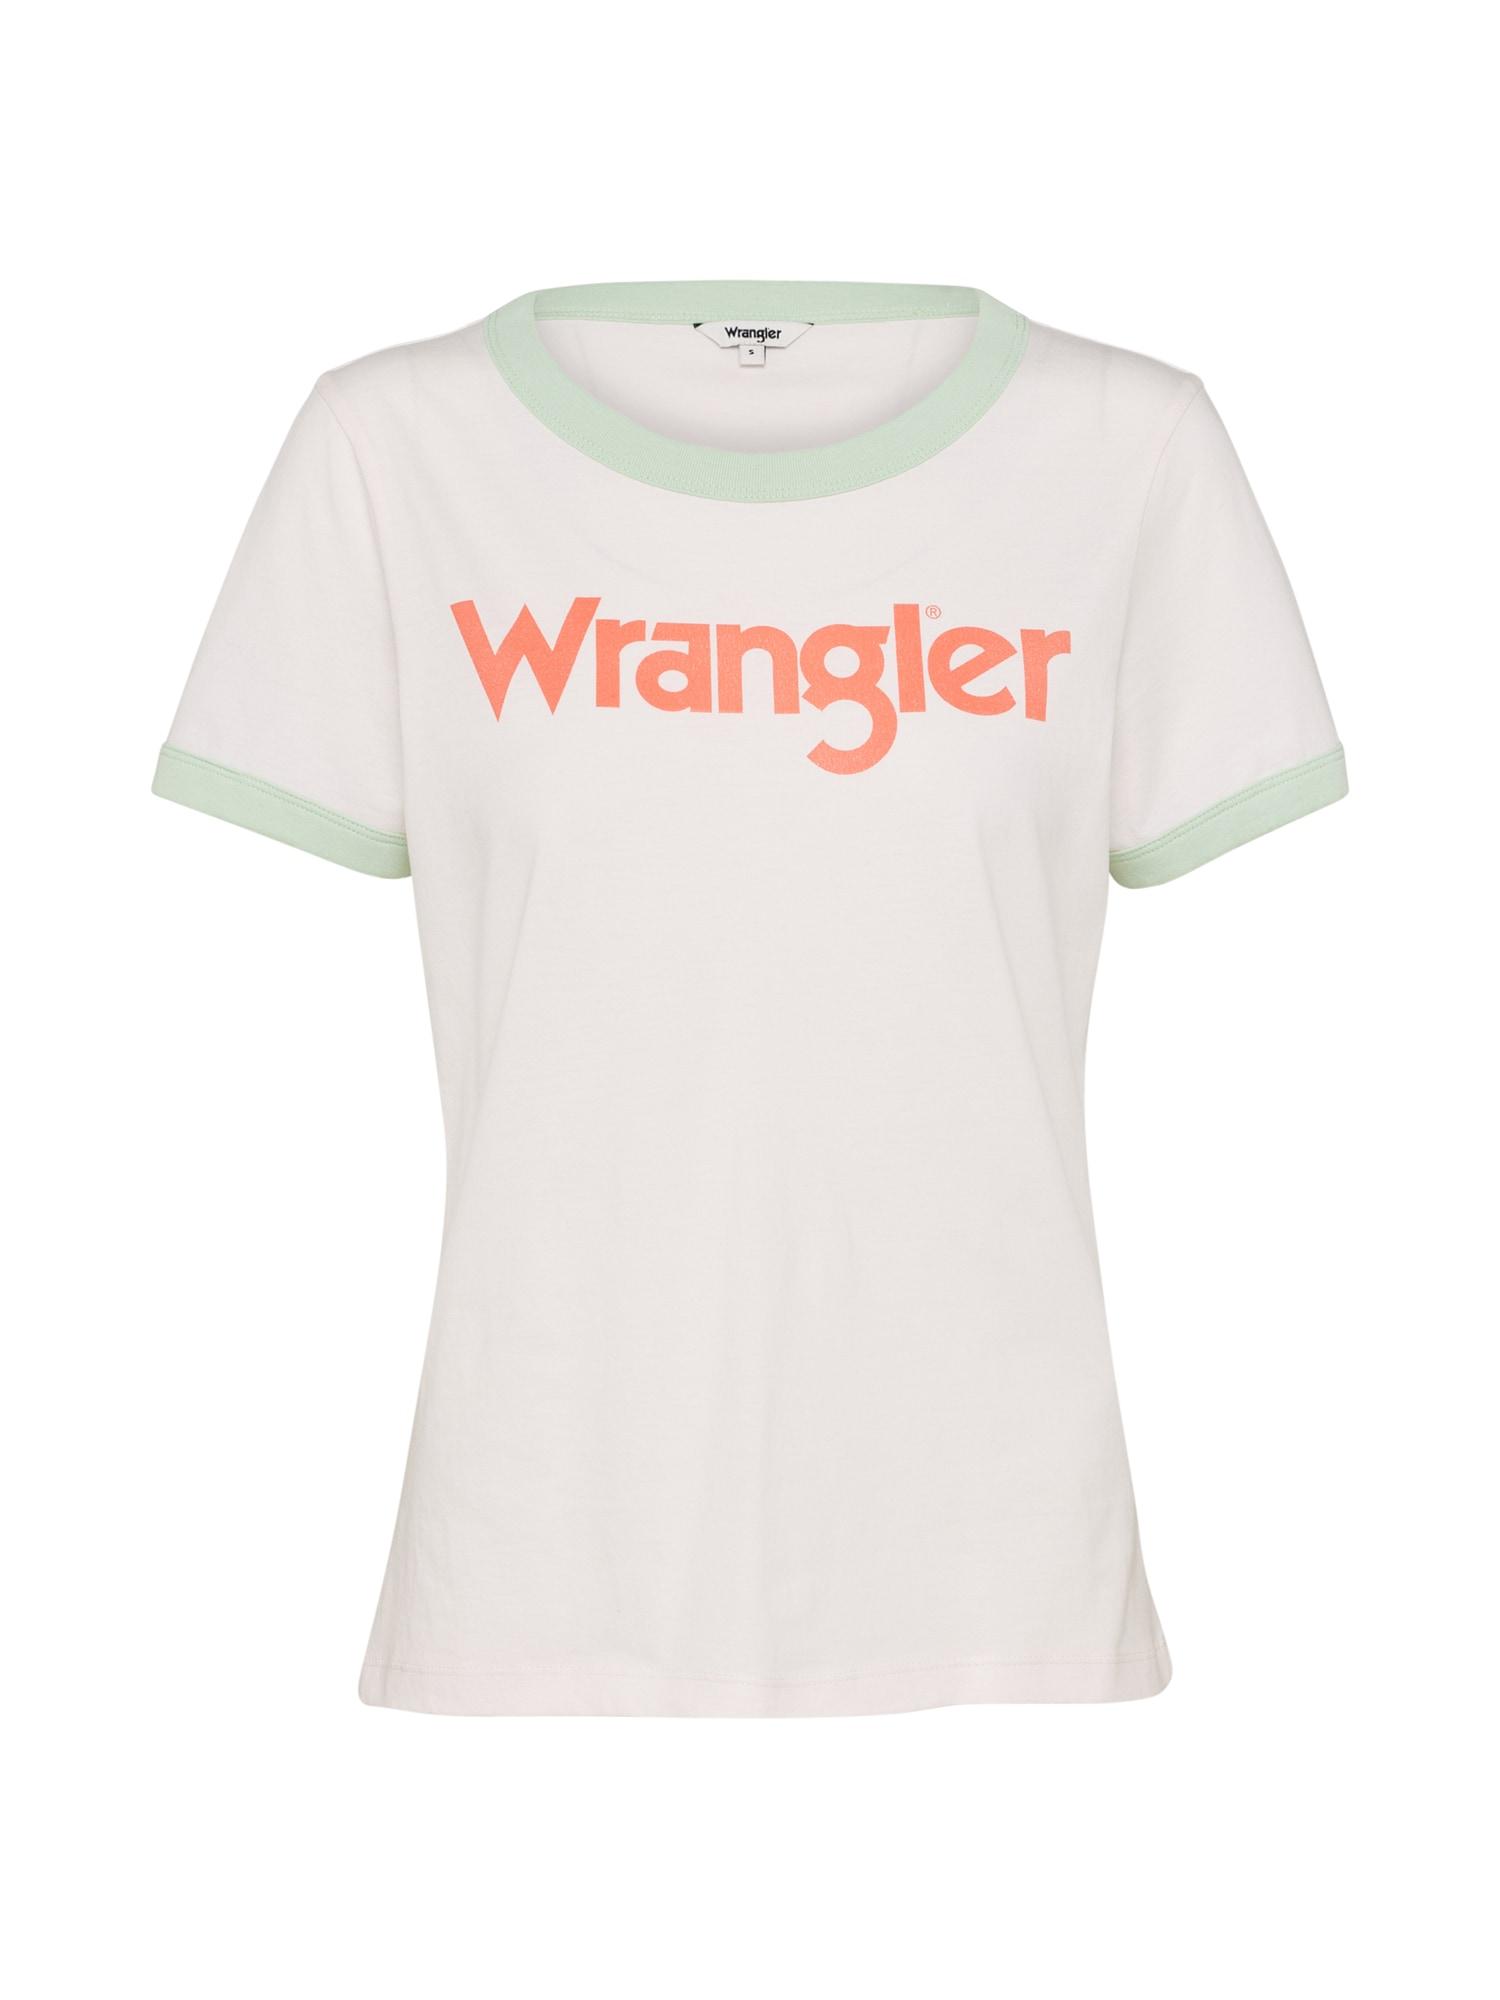 WRANGLER Dames Shirt RETRO KABEL champagne muntgroen sinaasappel